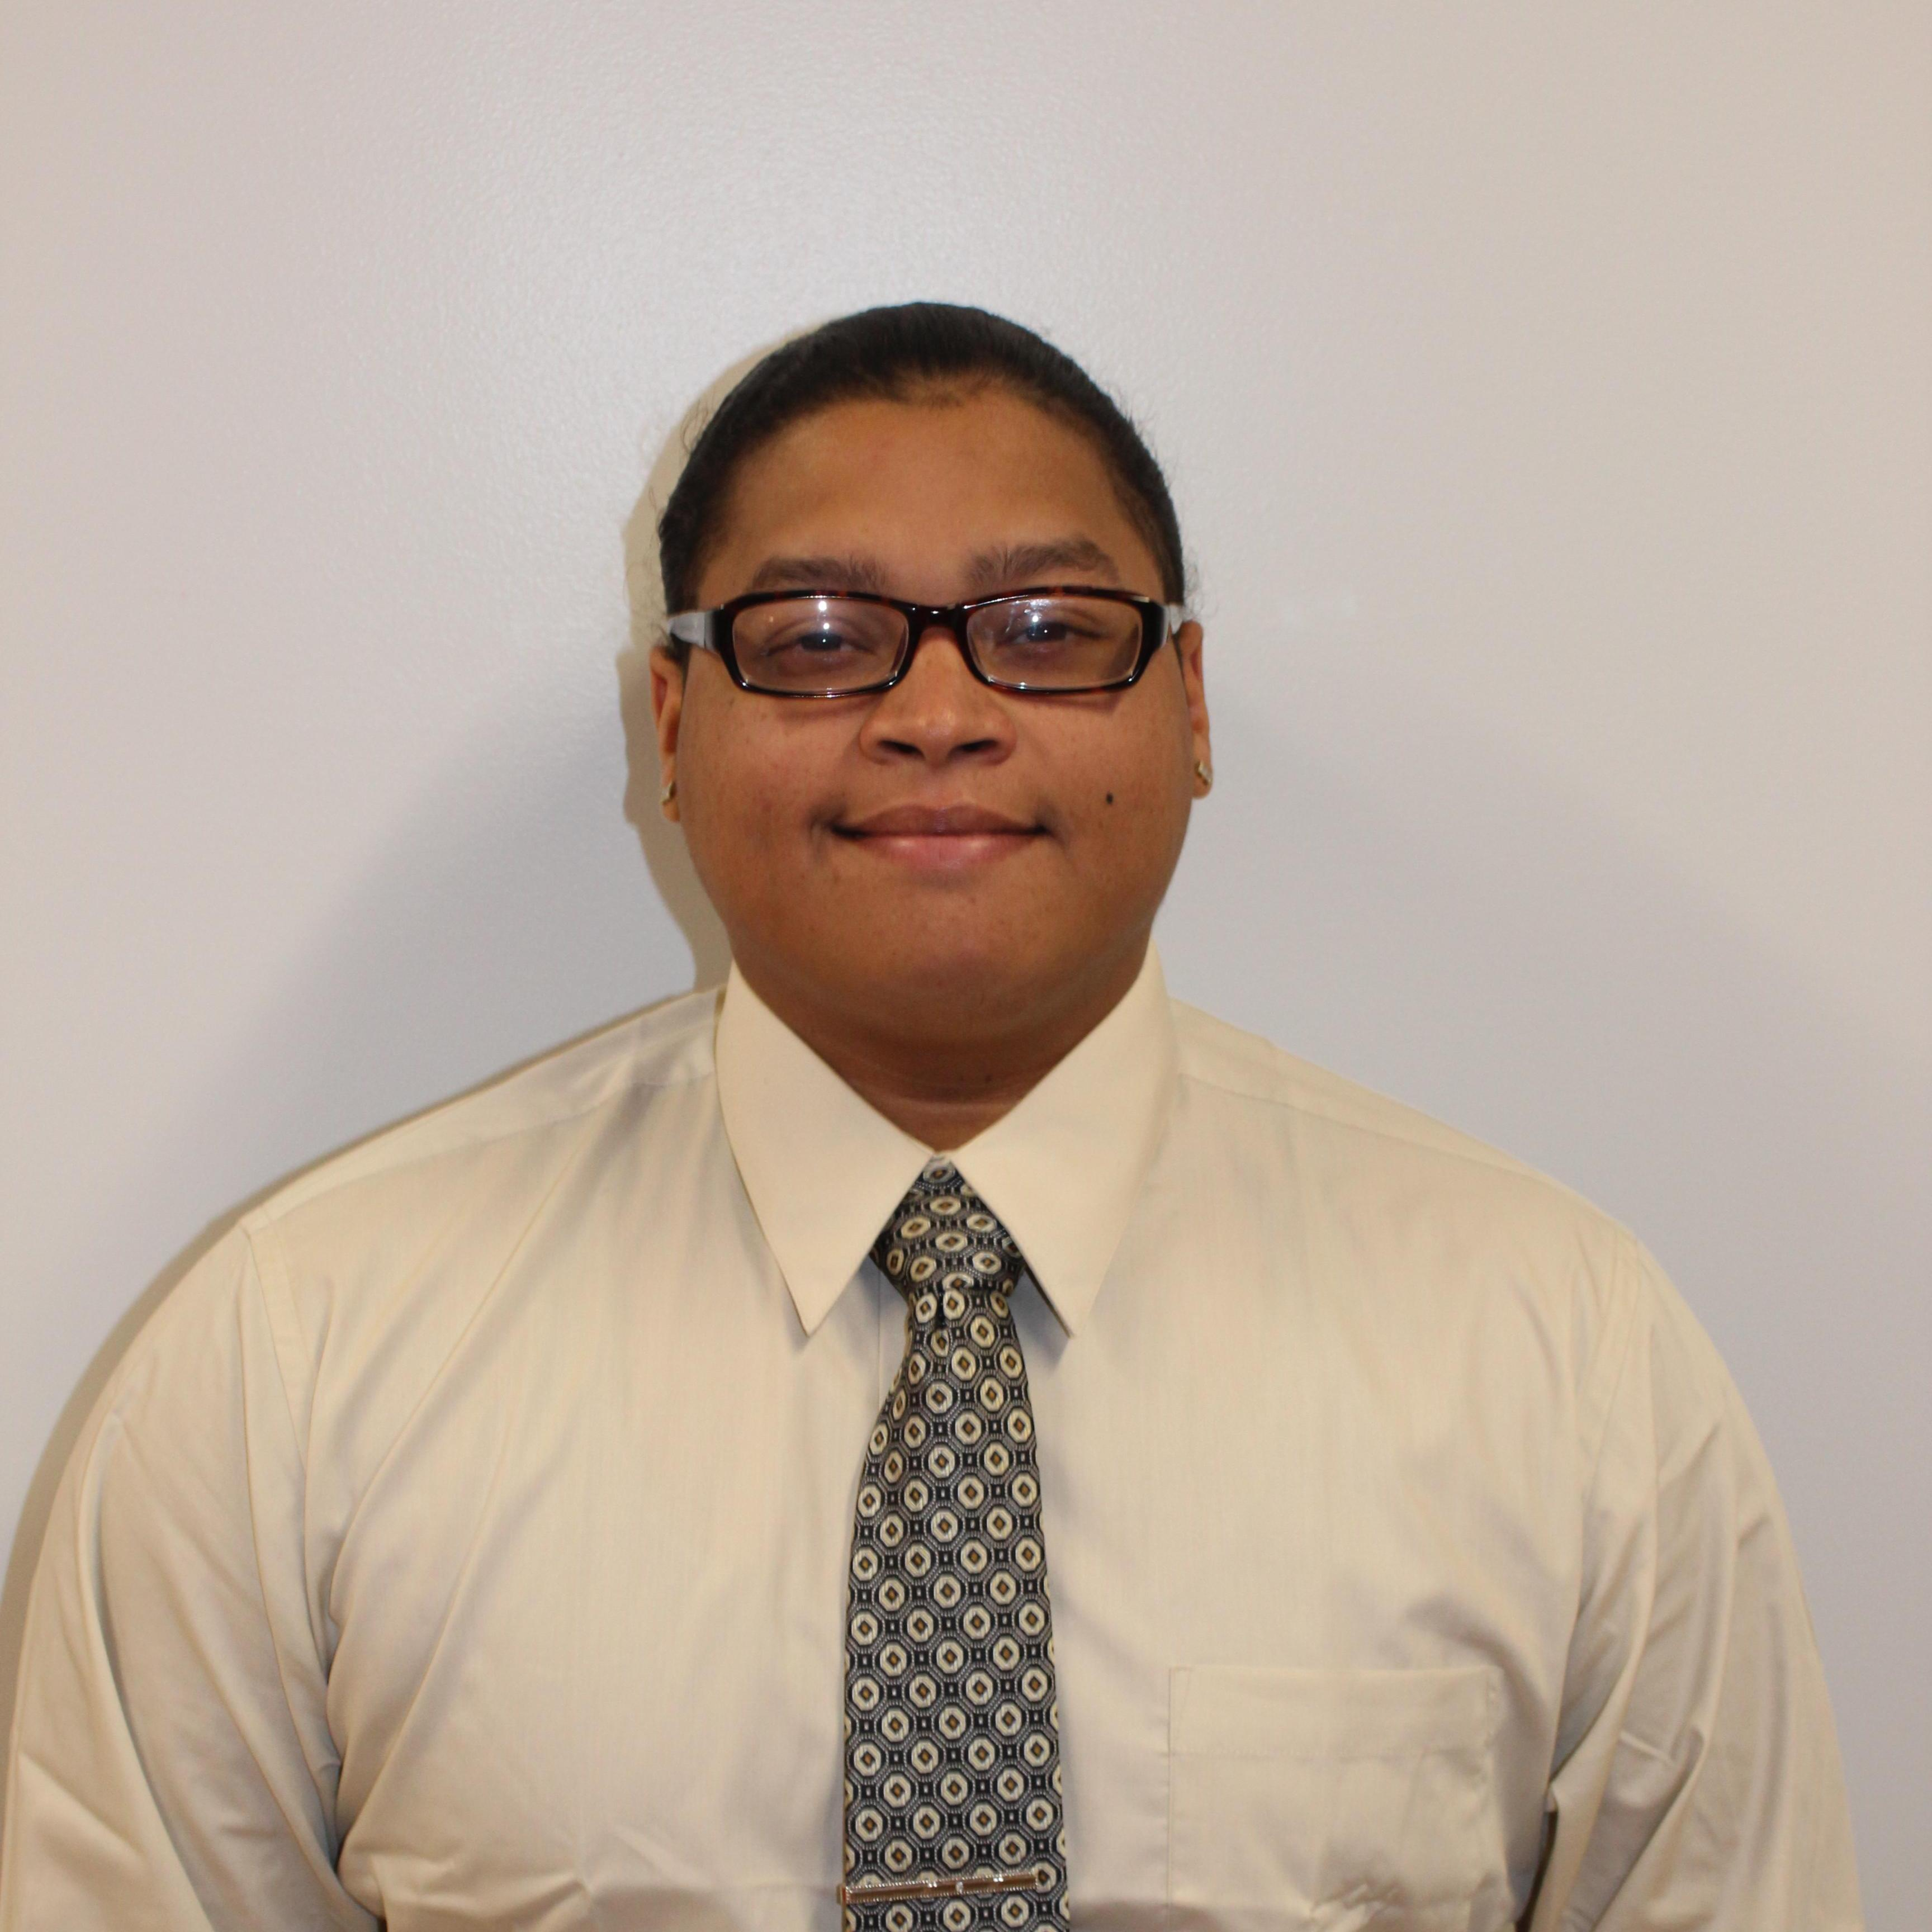 Lee Suarez's Profile Photo